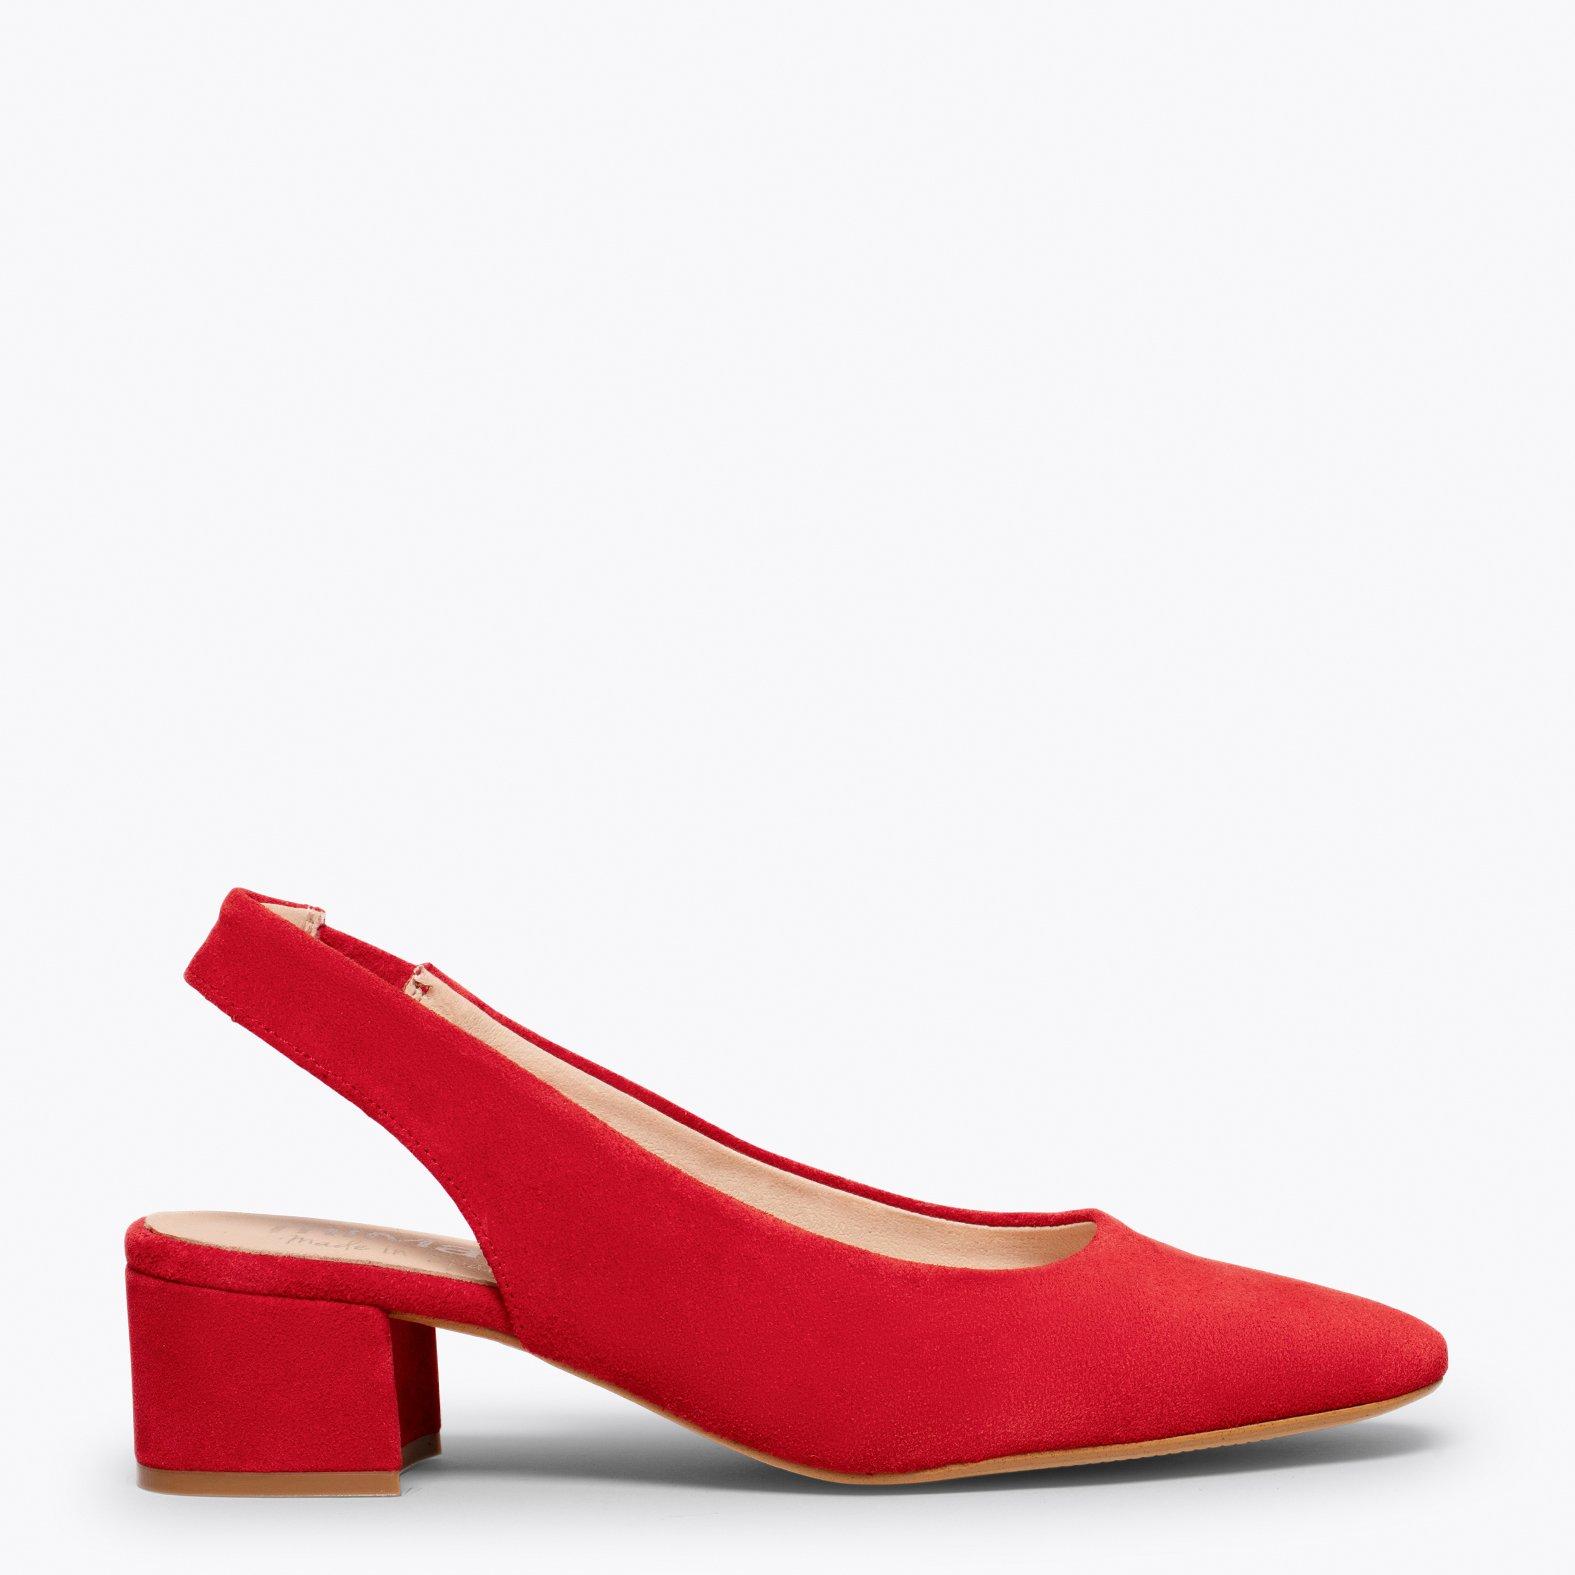 LADY Zapato destalonado con puntera cuadrada ROJO